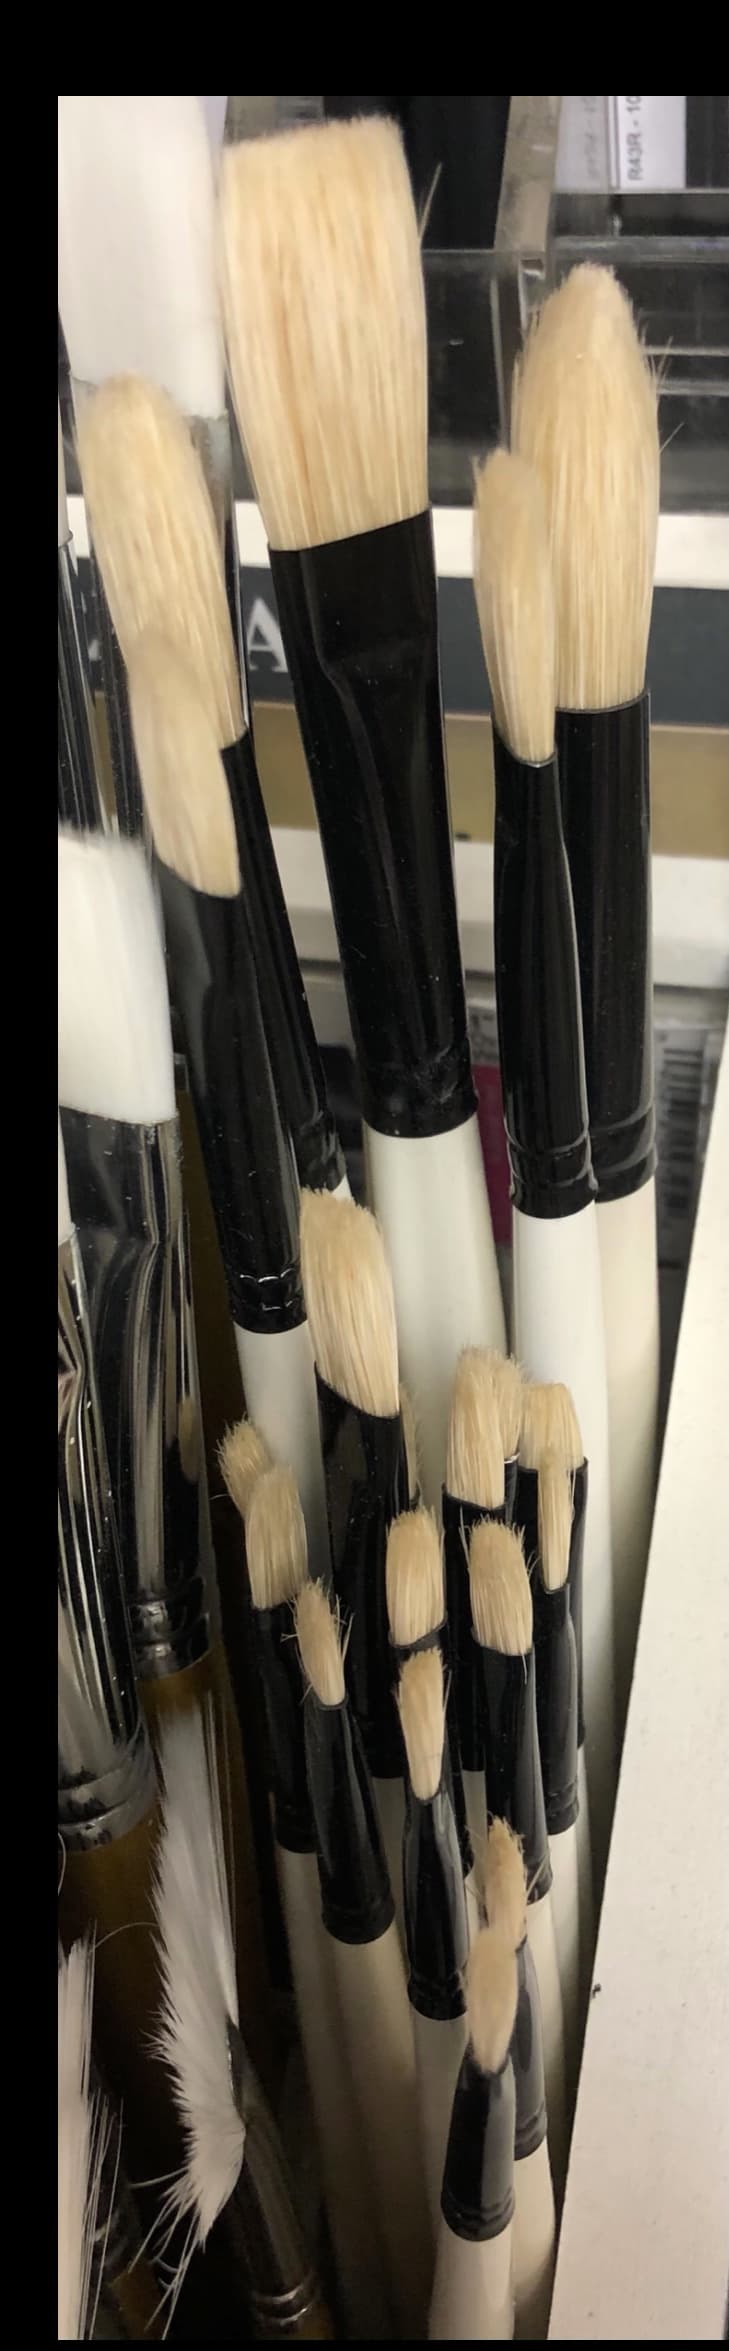 daler rowney hog hair brushes